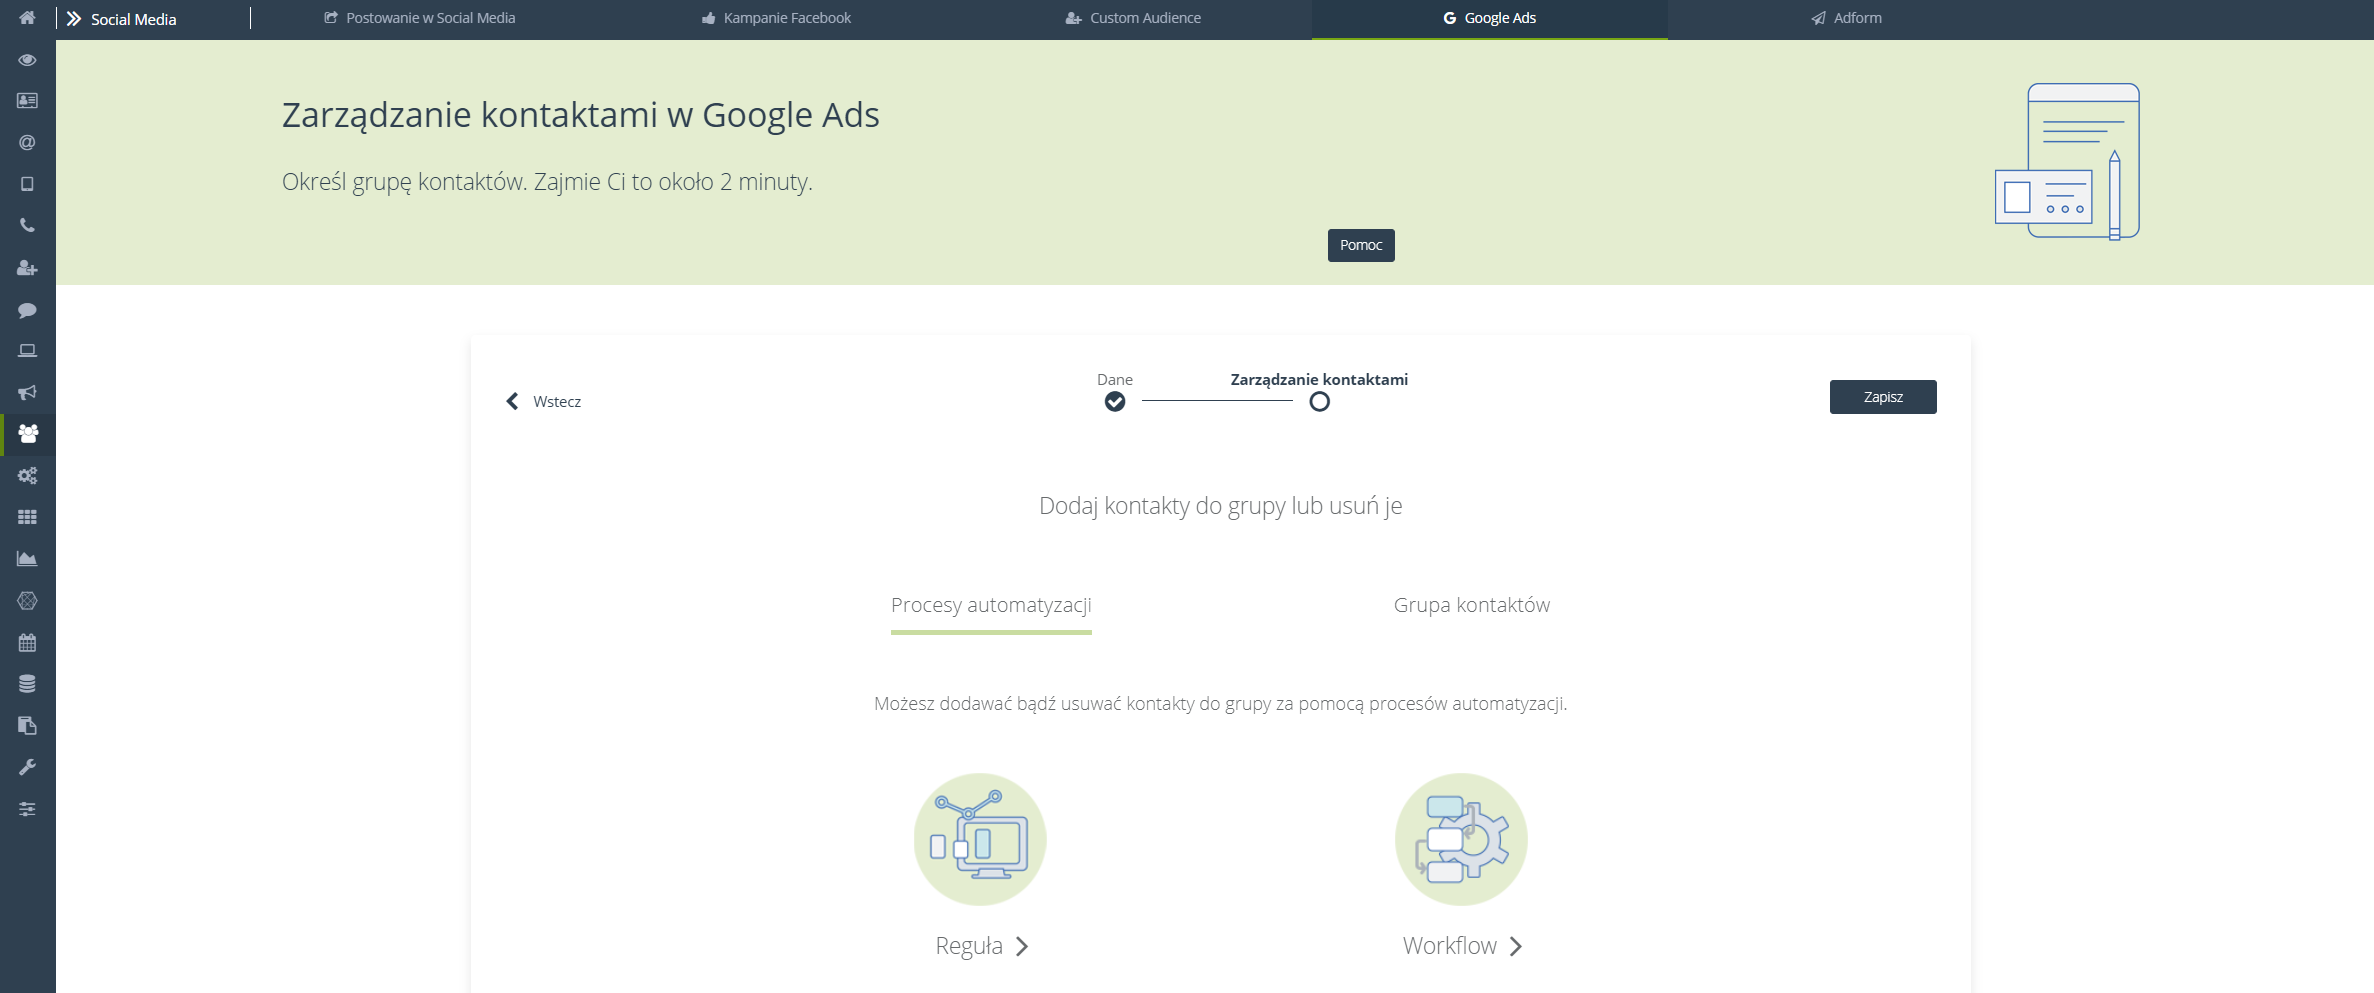 Adform, GoogleAds